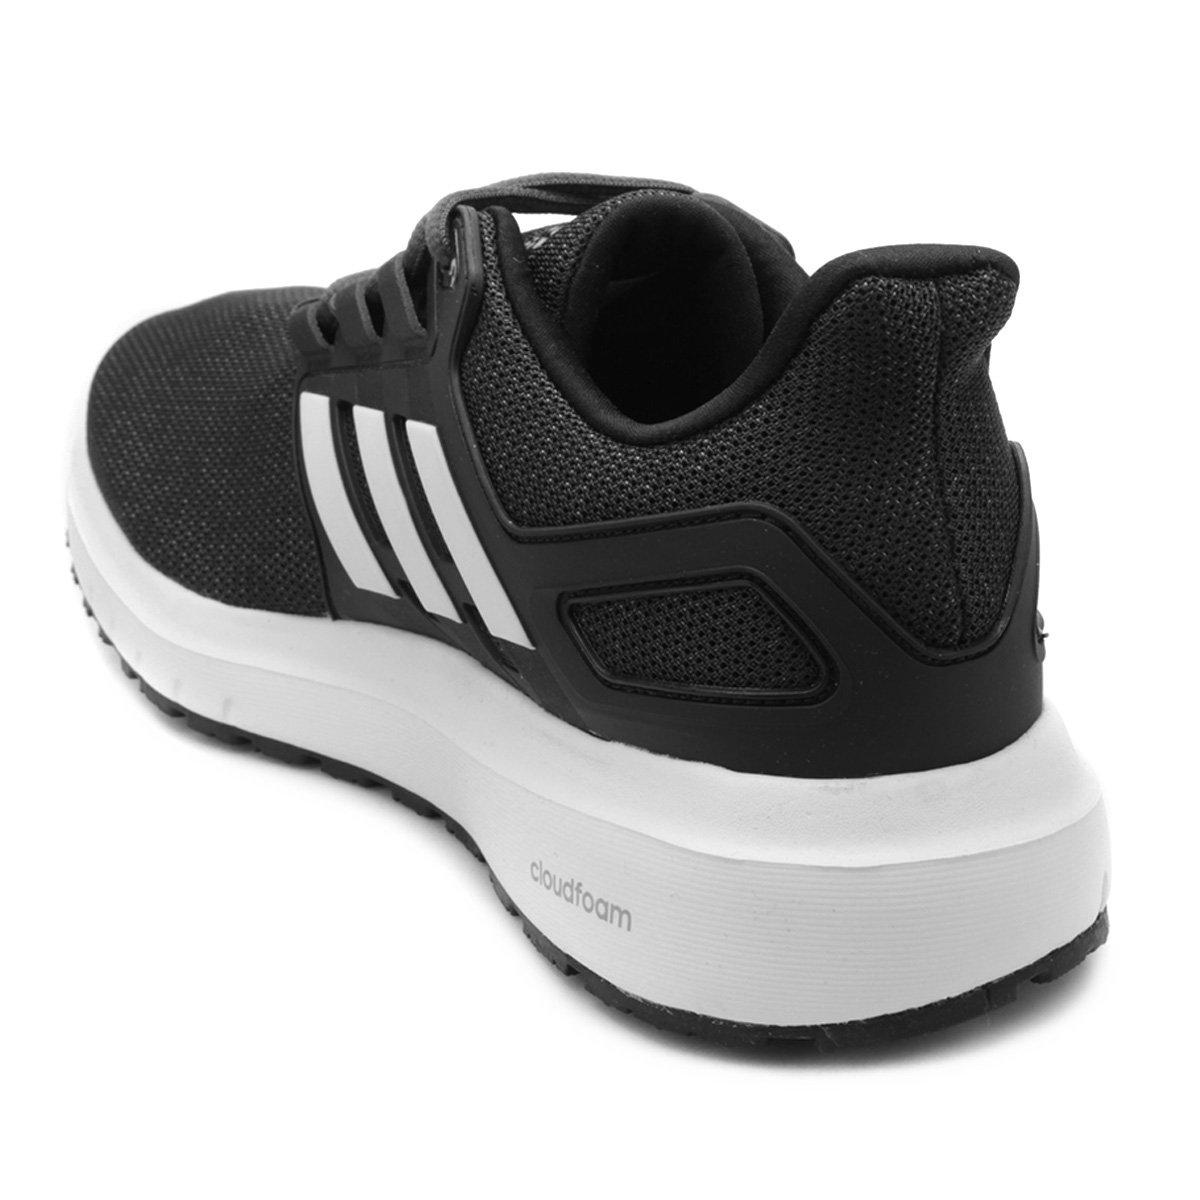 d37f393c2 Tênis Adidas Energy Cloud 2 Masculino - Tam: 41 - Shopping TudoAzul